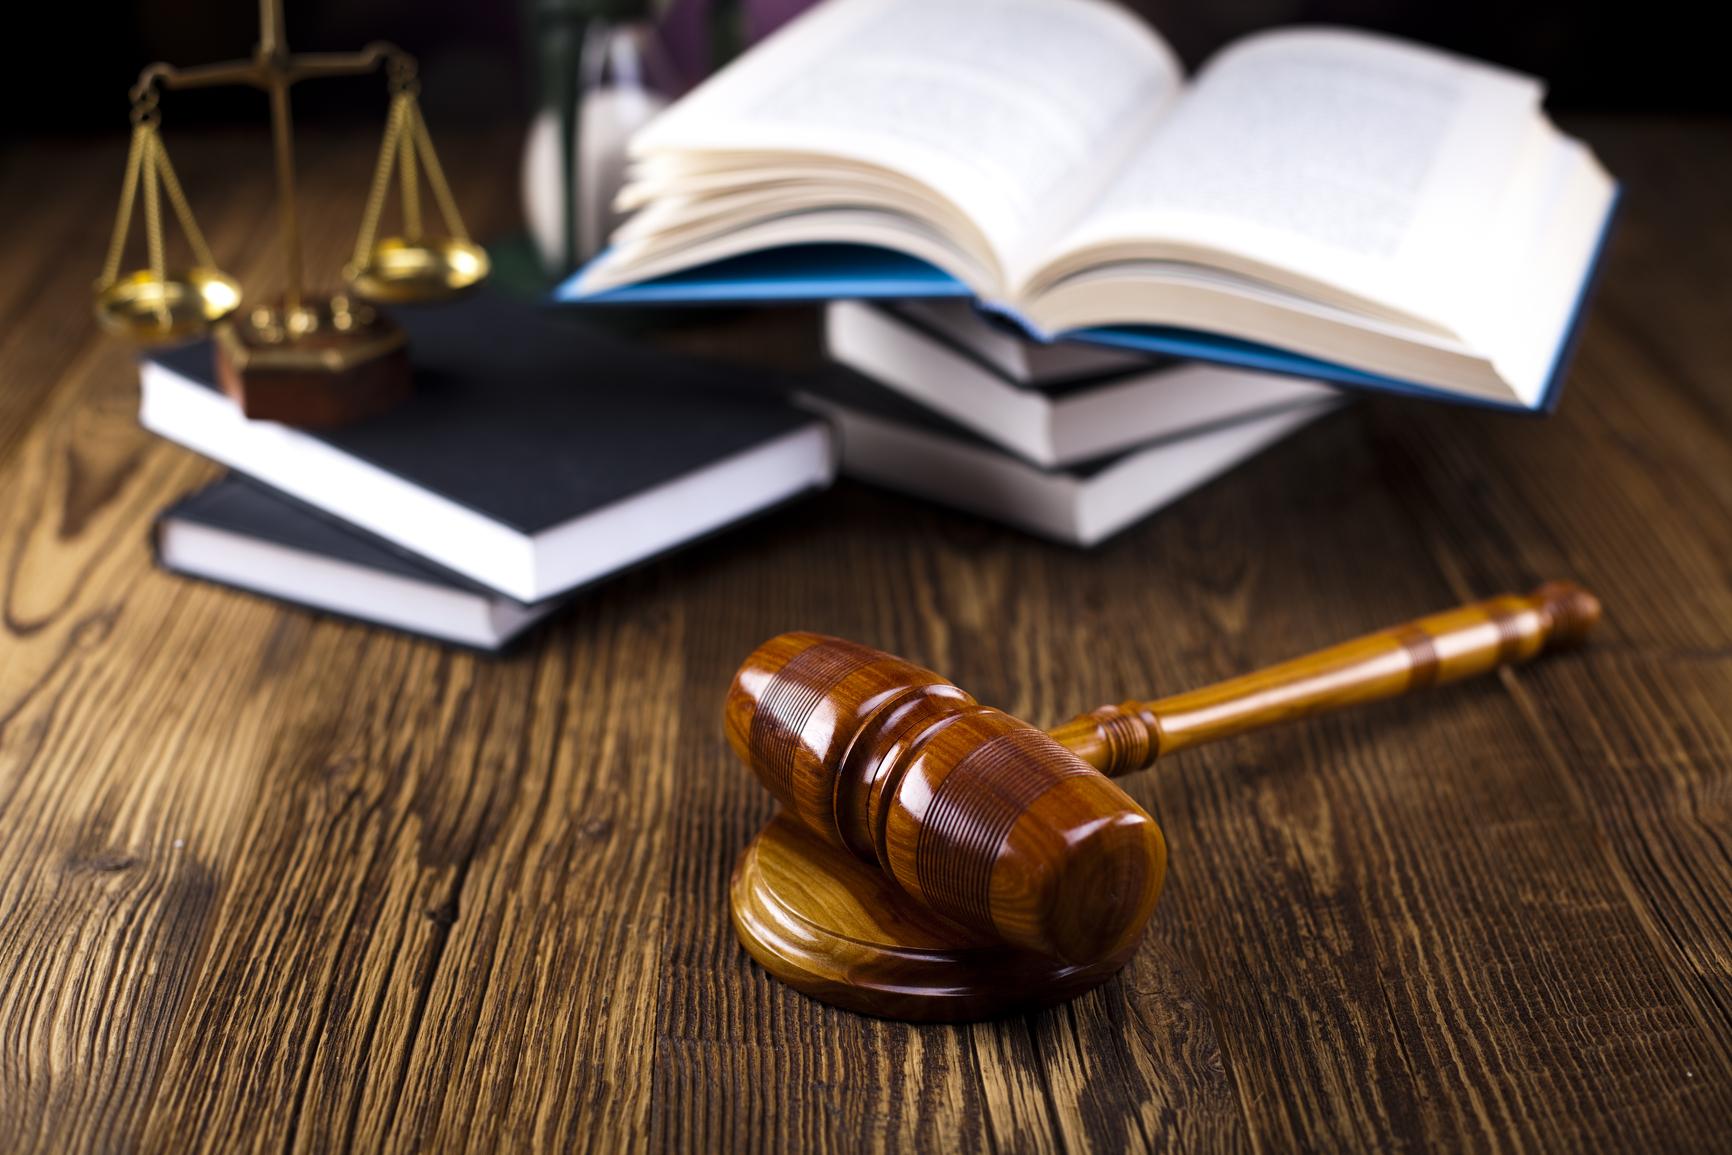 stockfresh_4020942_wooden-gavel-barrister-justice-concept-legal-system_sizeM